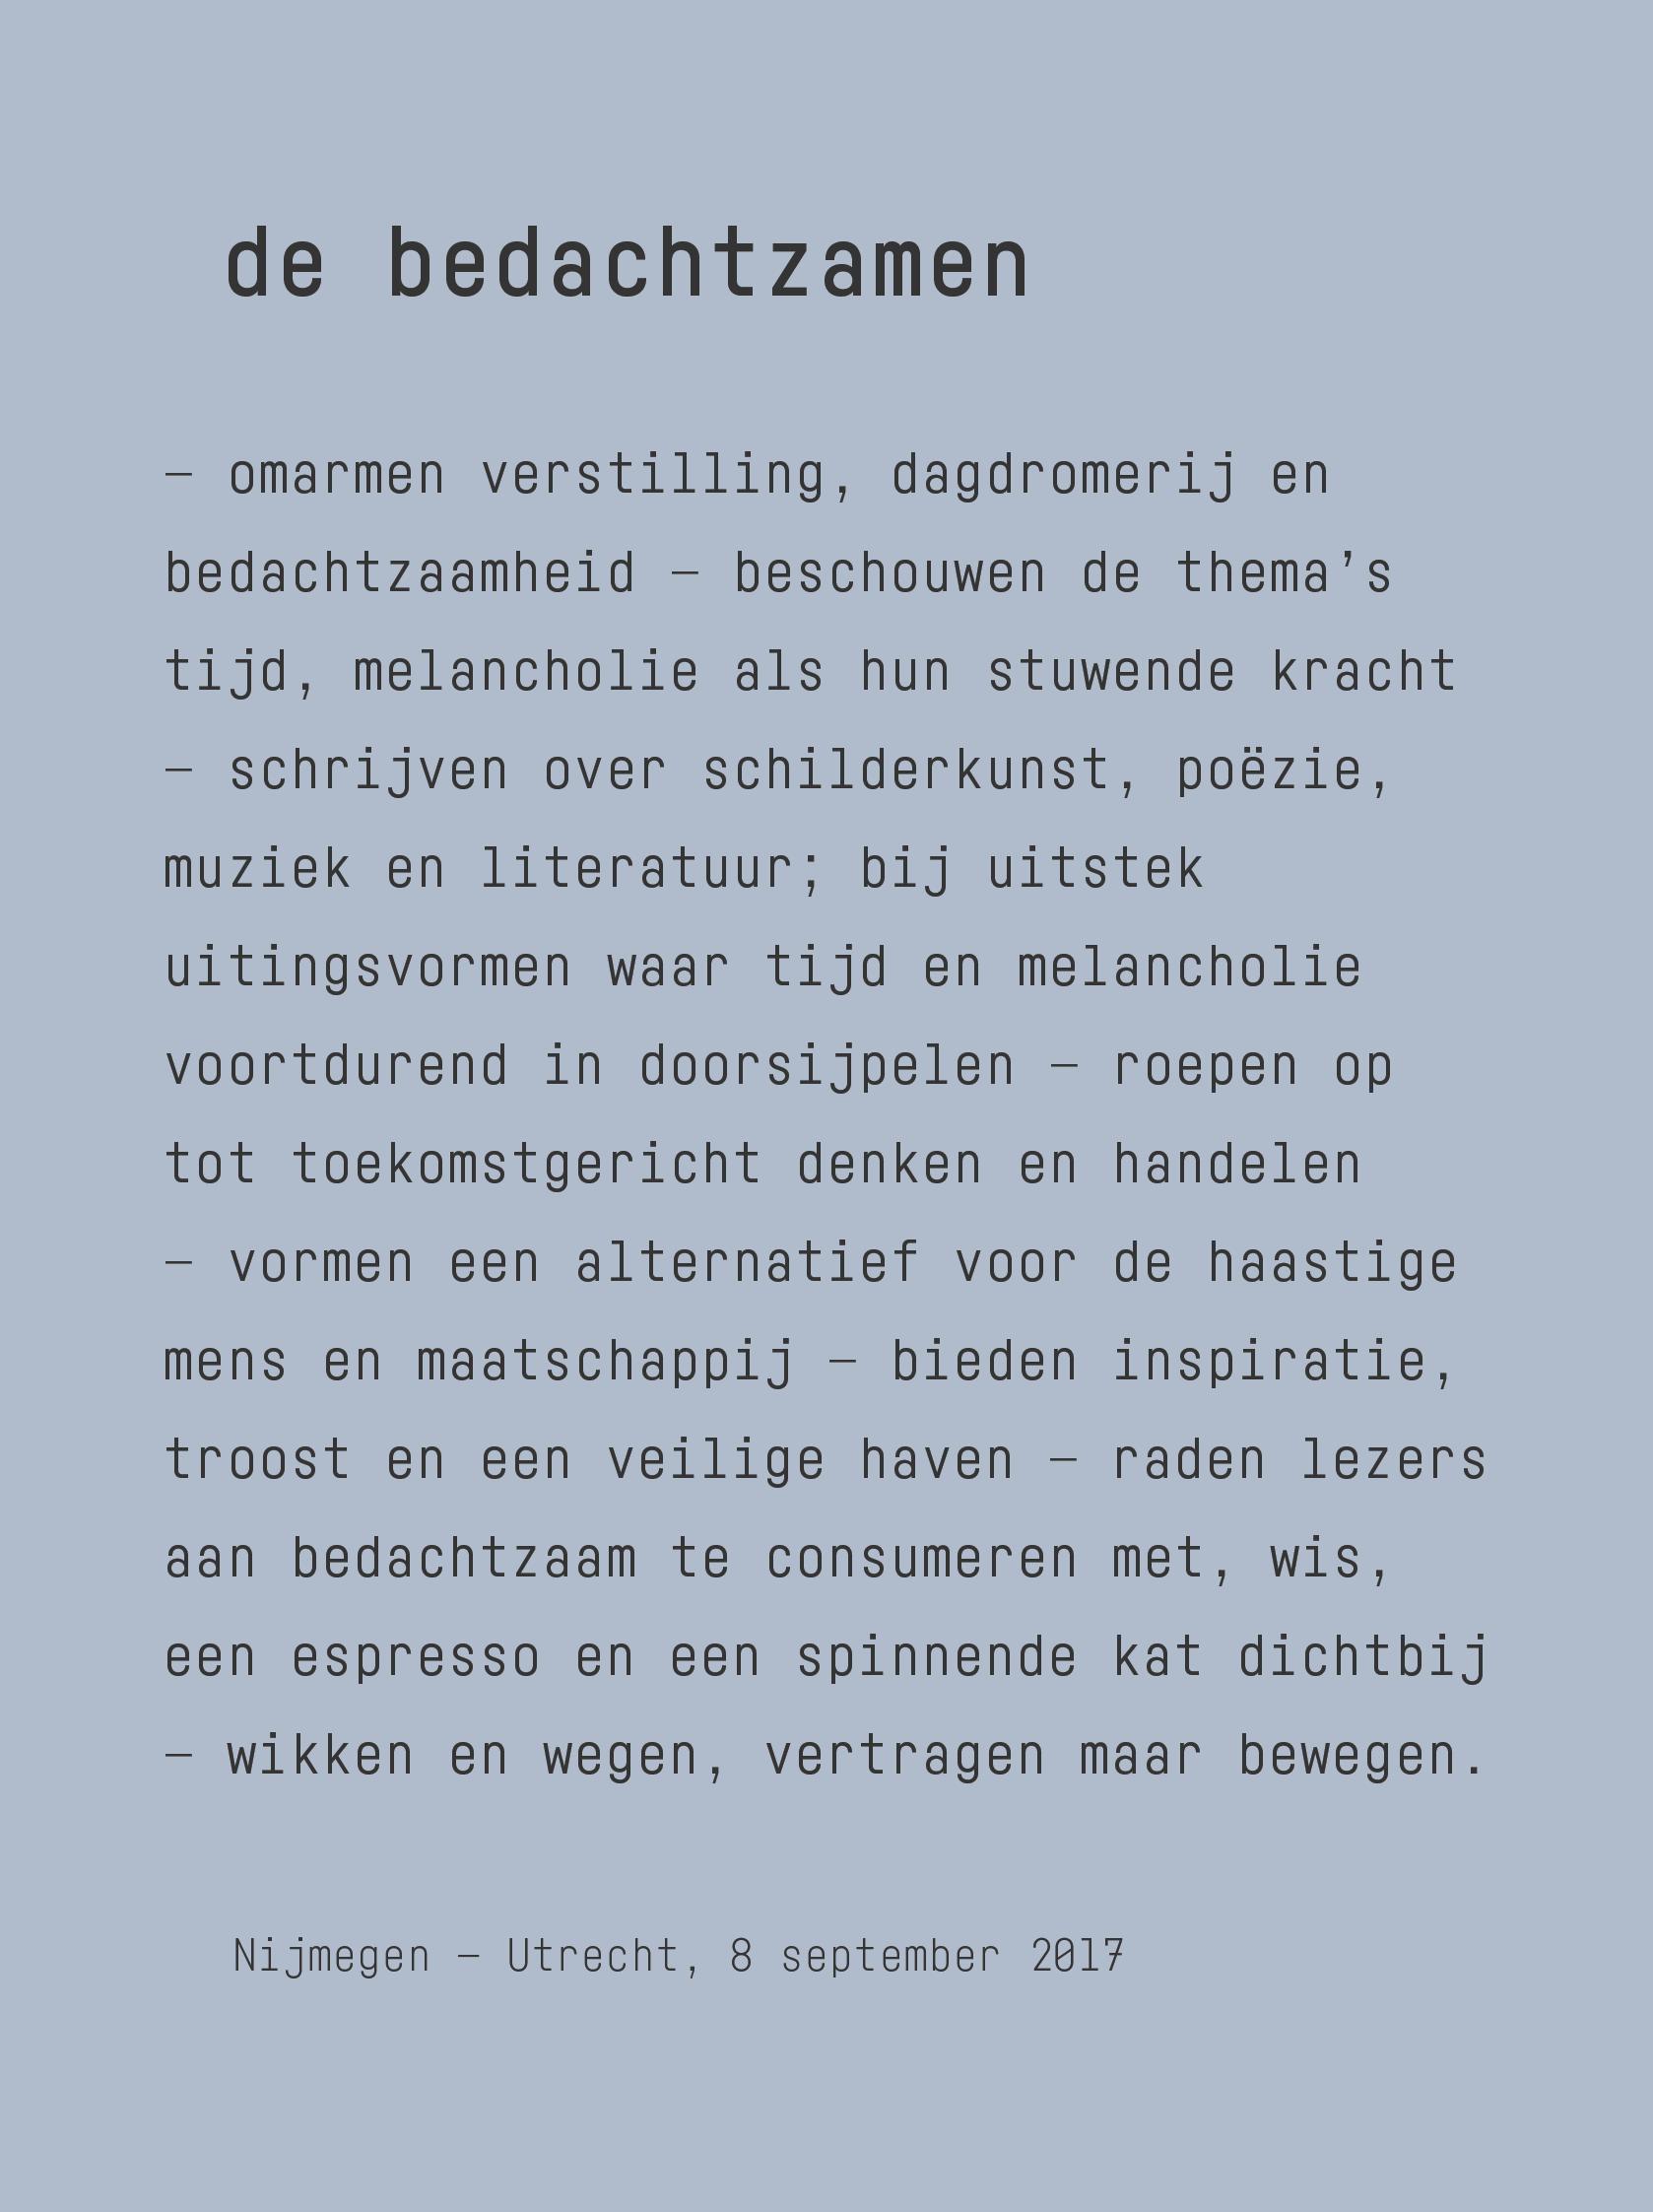 manifest_de_bedachtzamen